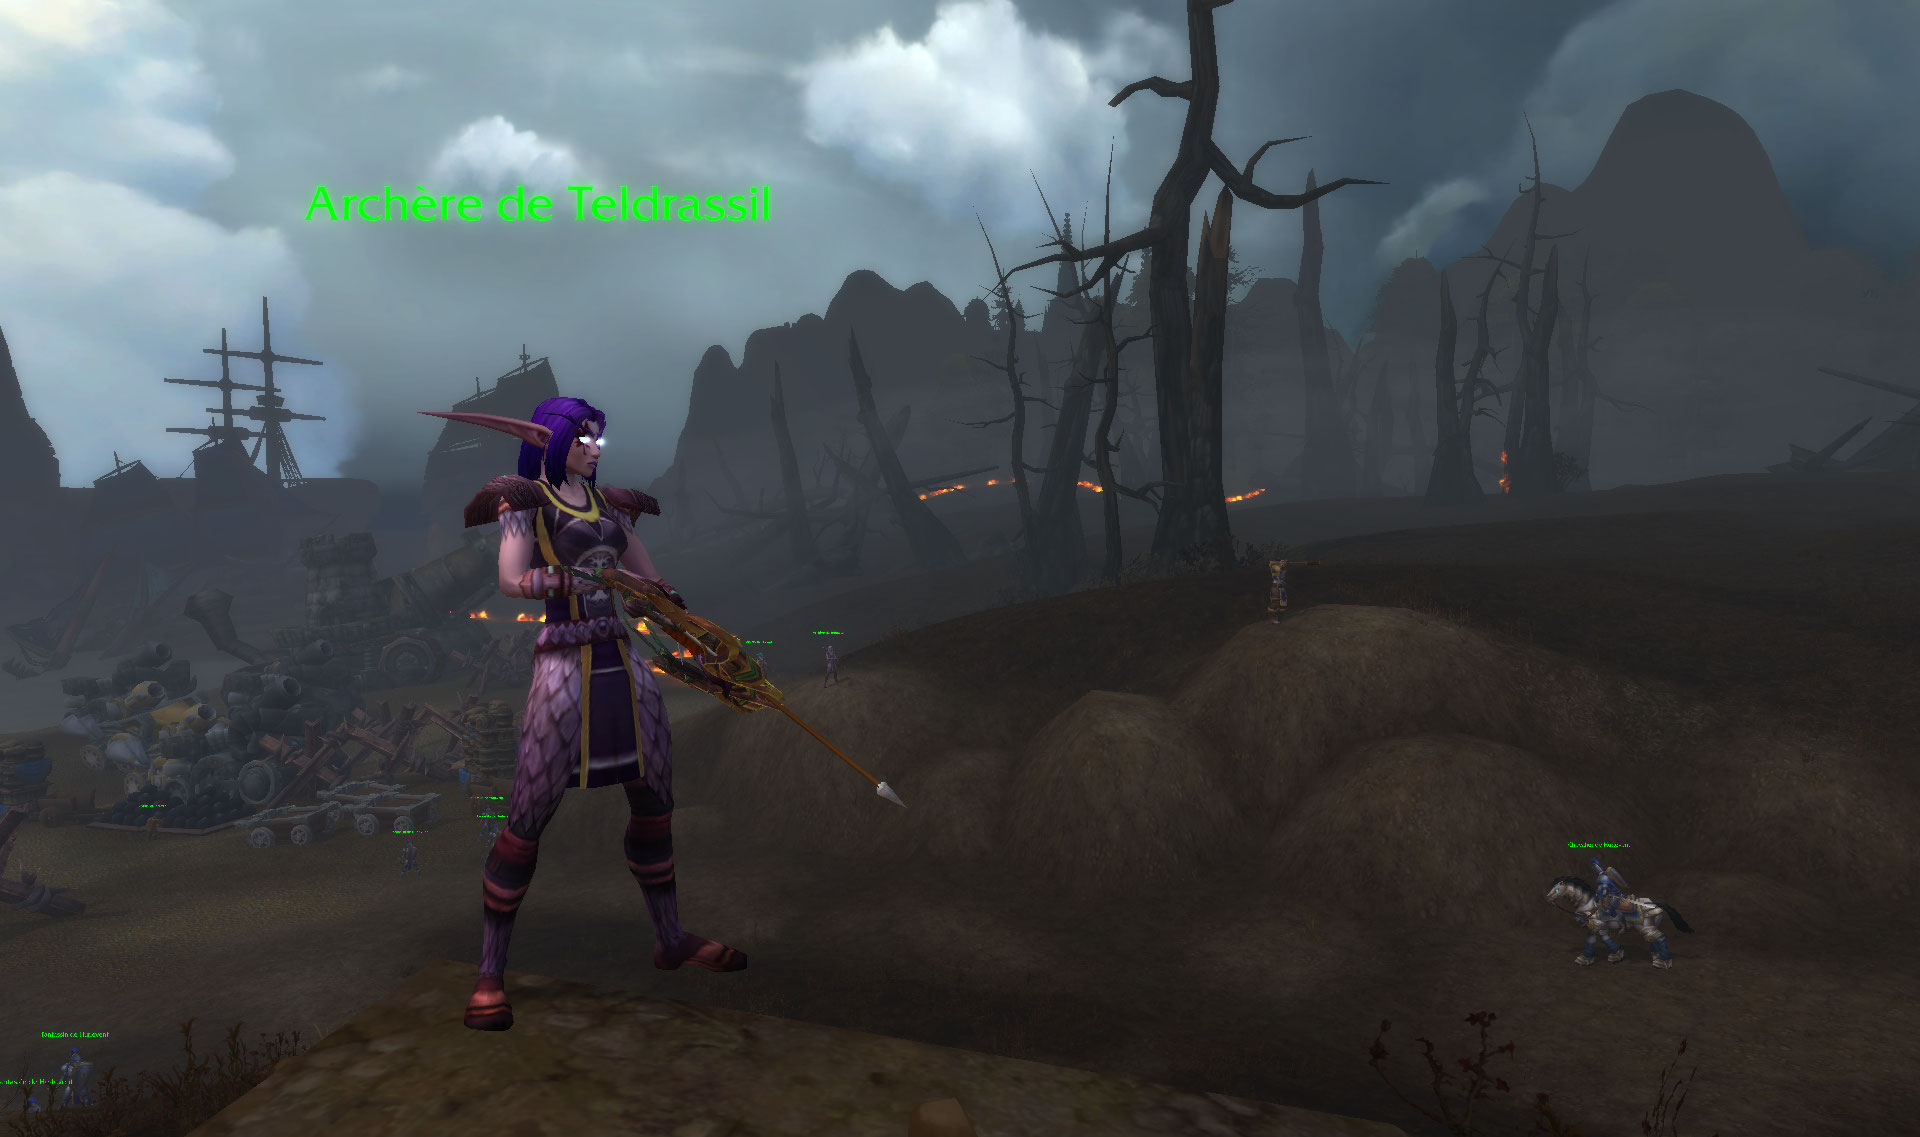 Bataille de Lordaeron sur World of Warcraft: Battle for Azeroth.